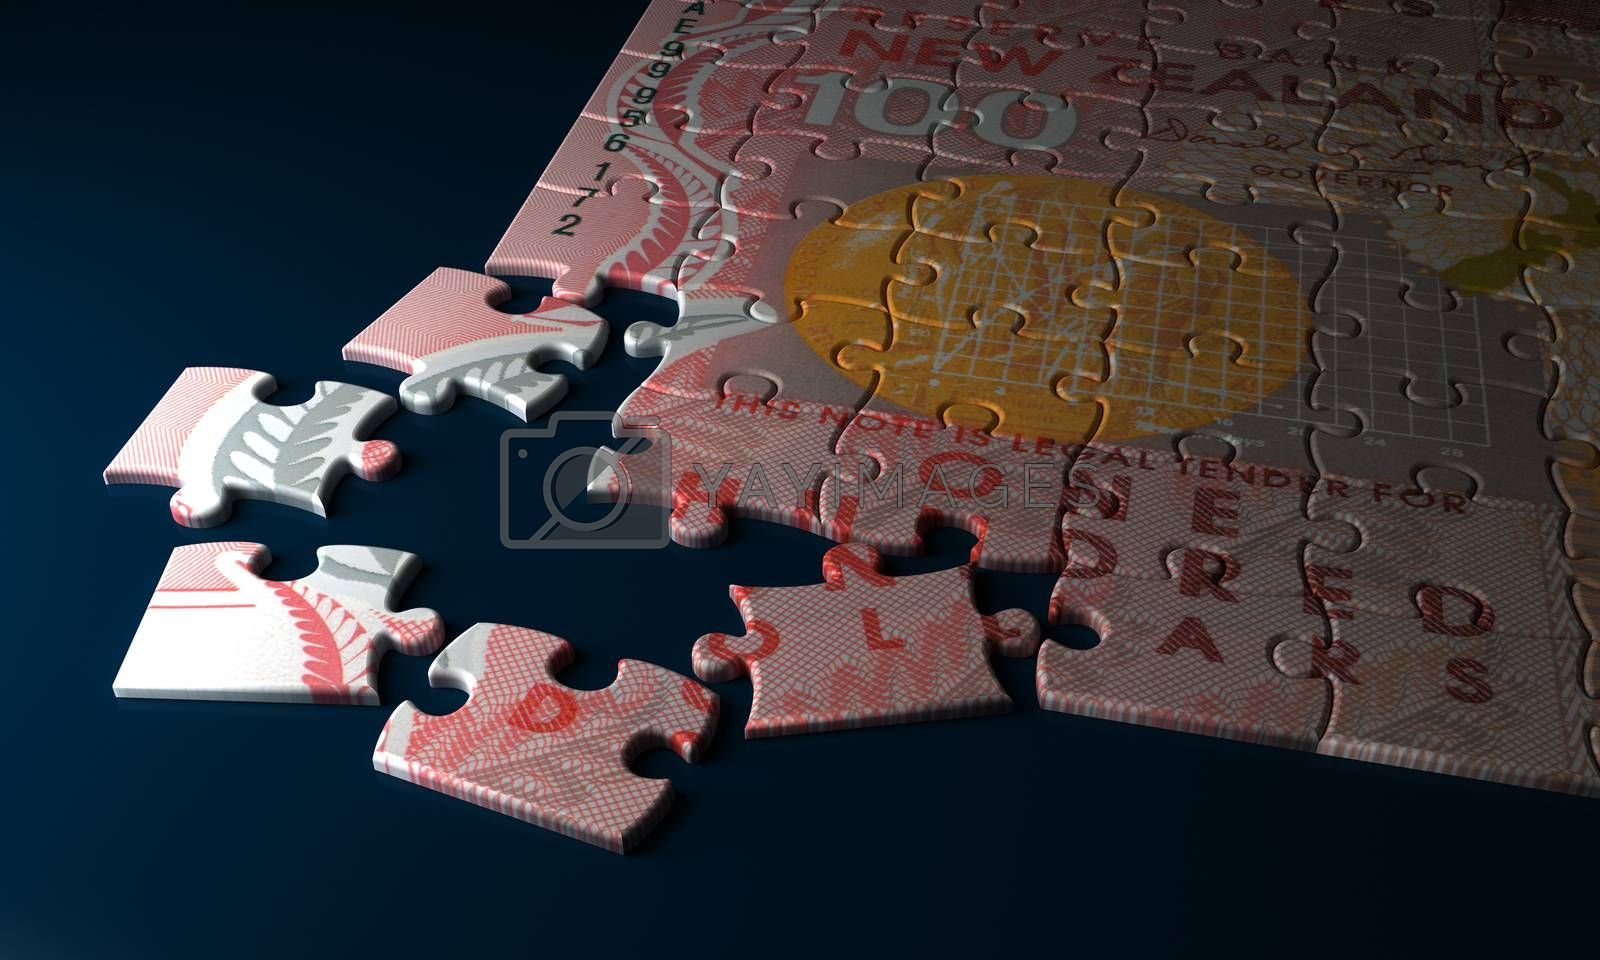 New Zealand Dollar Puzzle